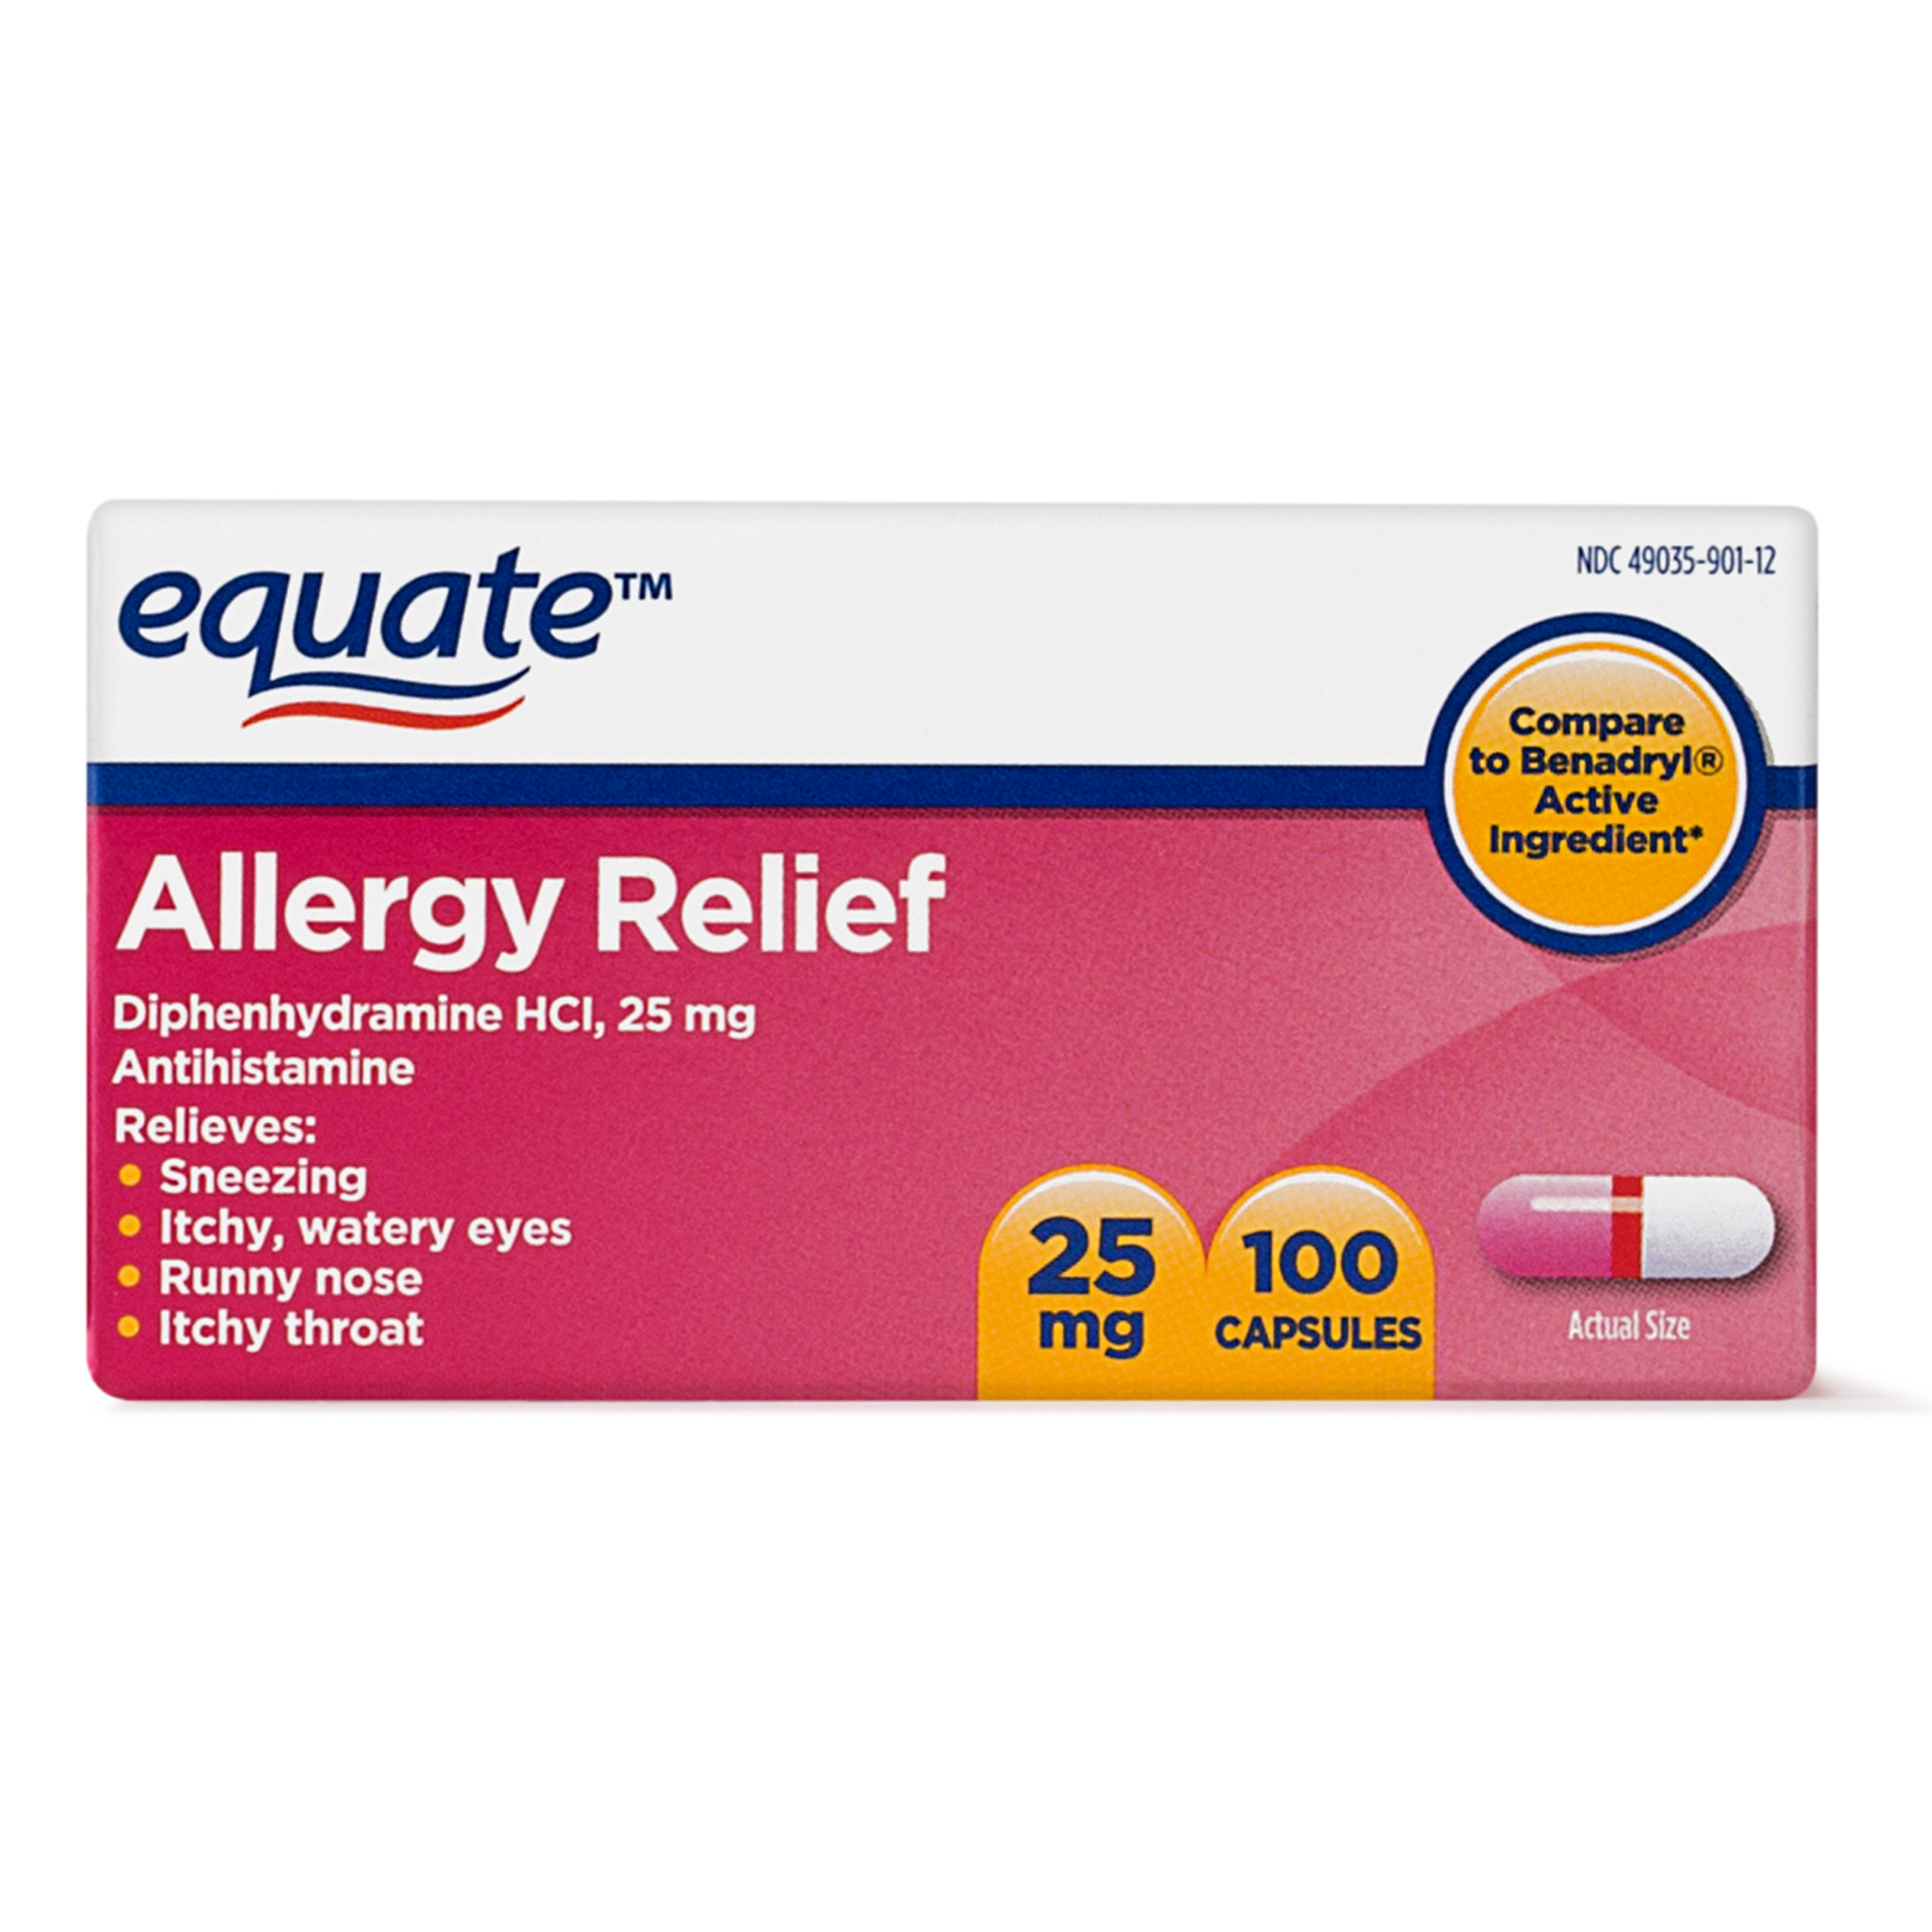 Equate Allergy Relief Diphenhydramine Antihistamine Capsules, 25 mg, 100 Ct